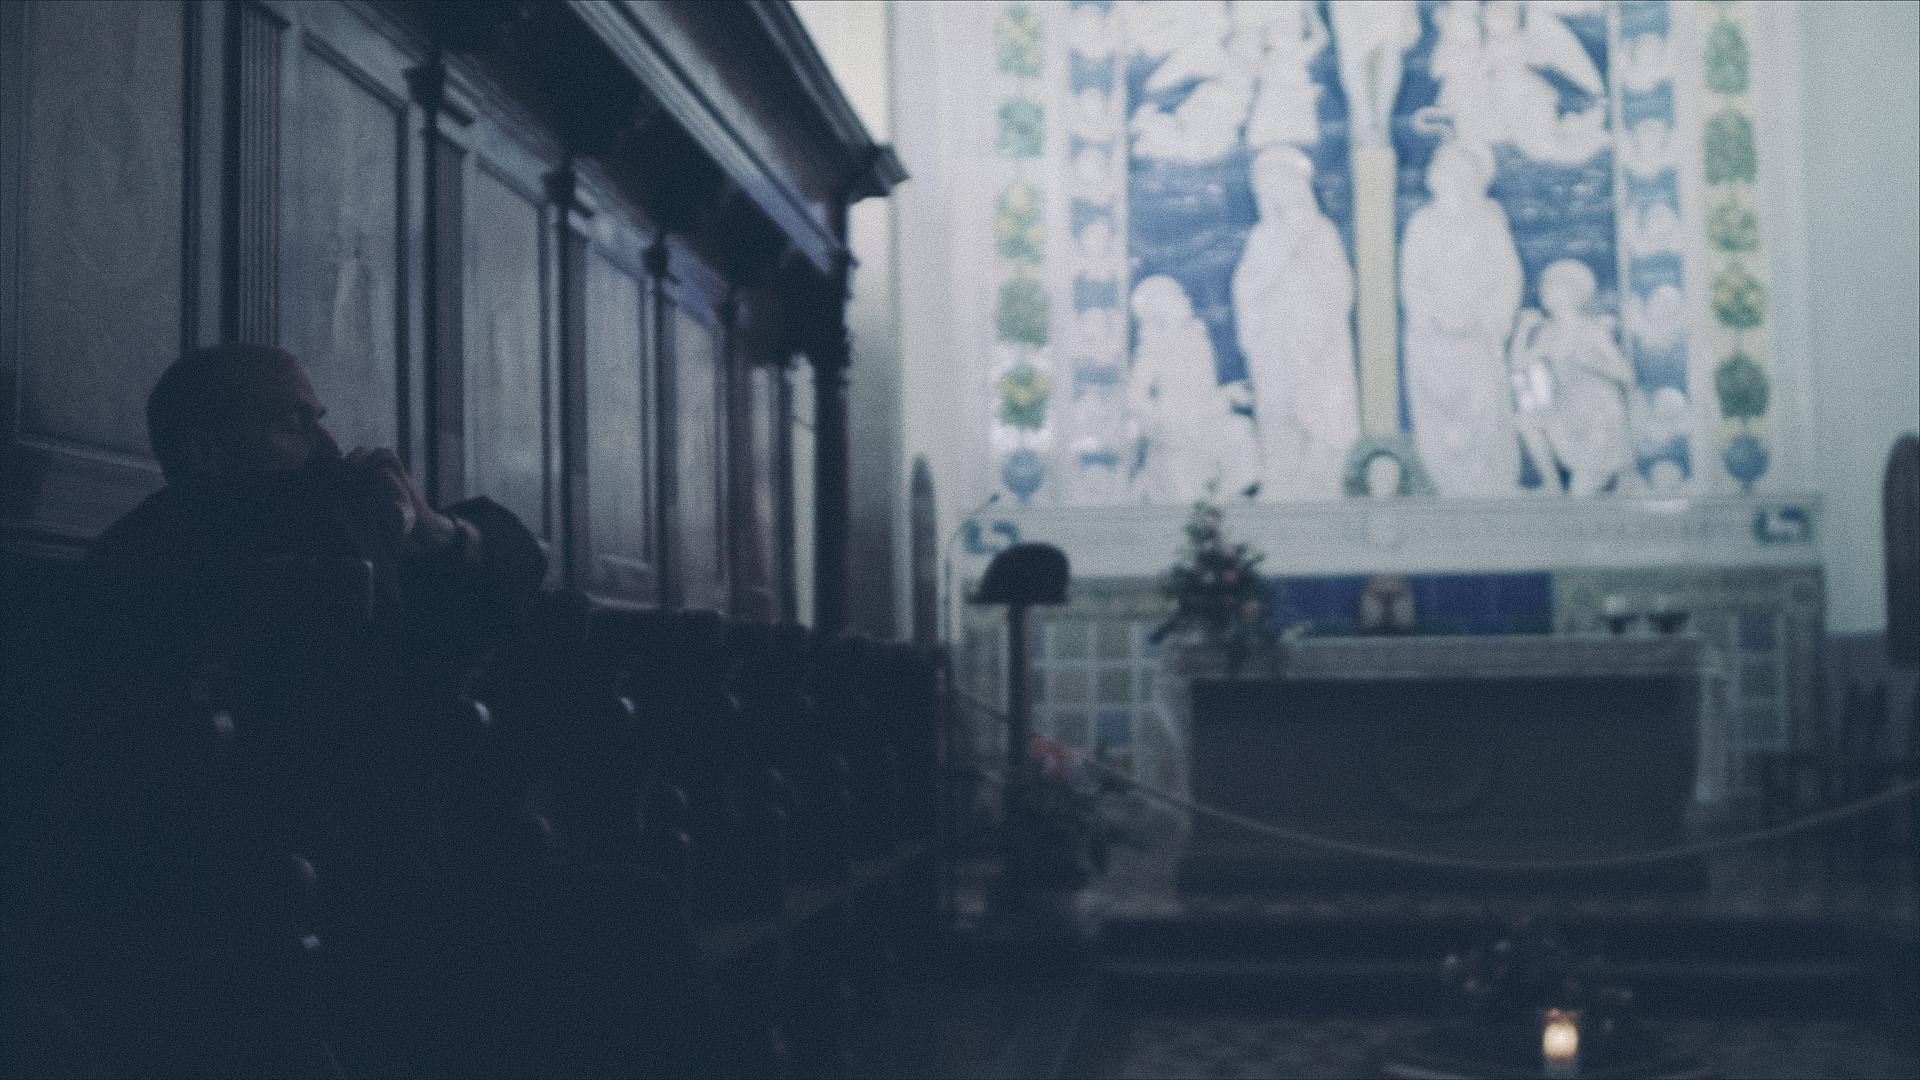 Cinemascope 2-35-1 Croplines.00_04_28_23.Still035.jpg